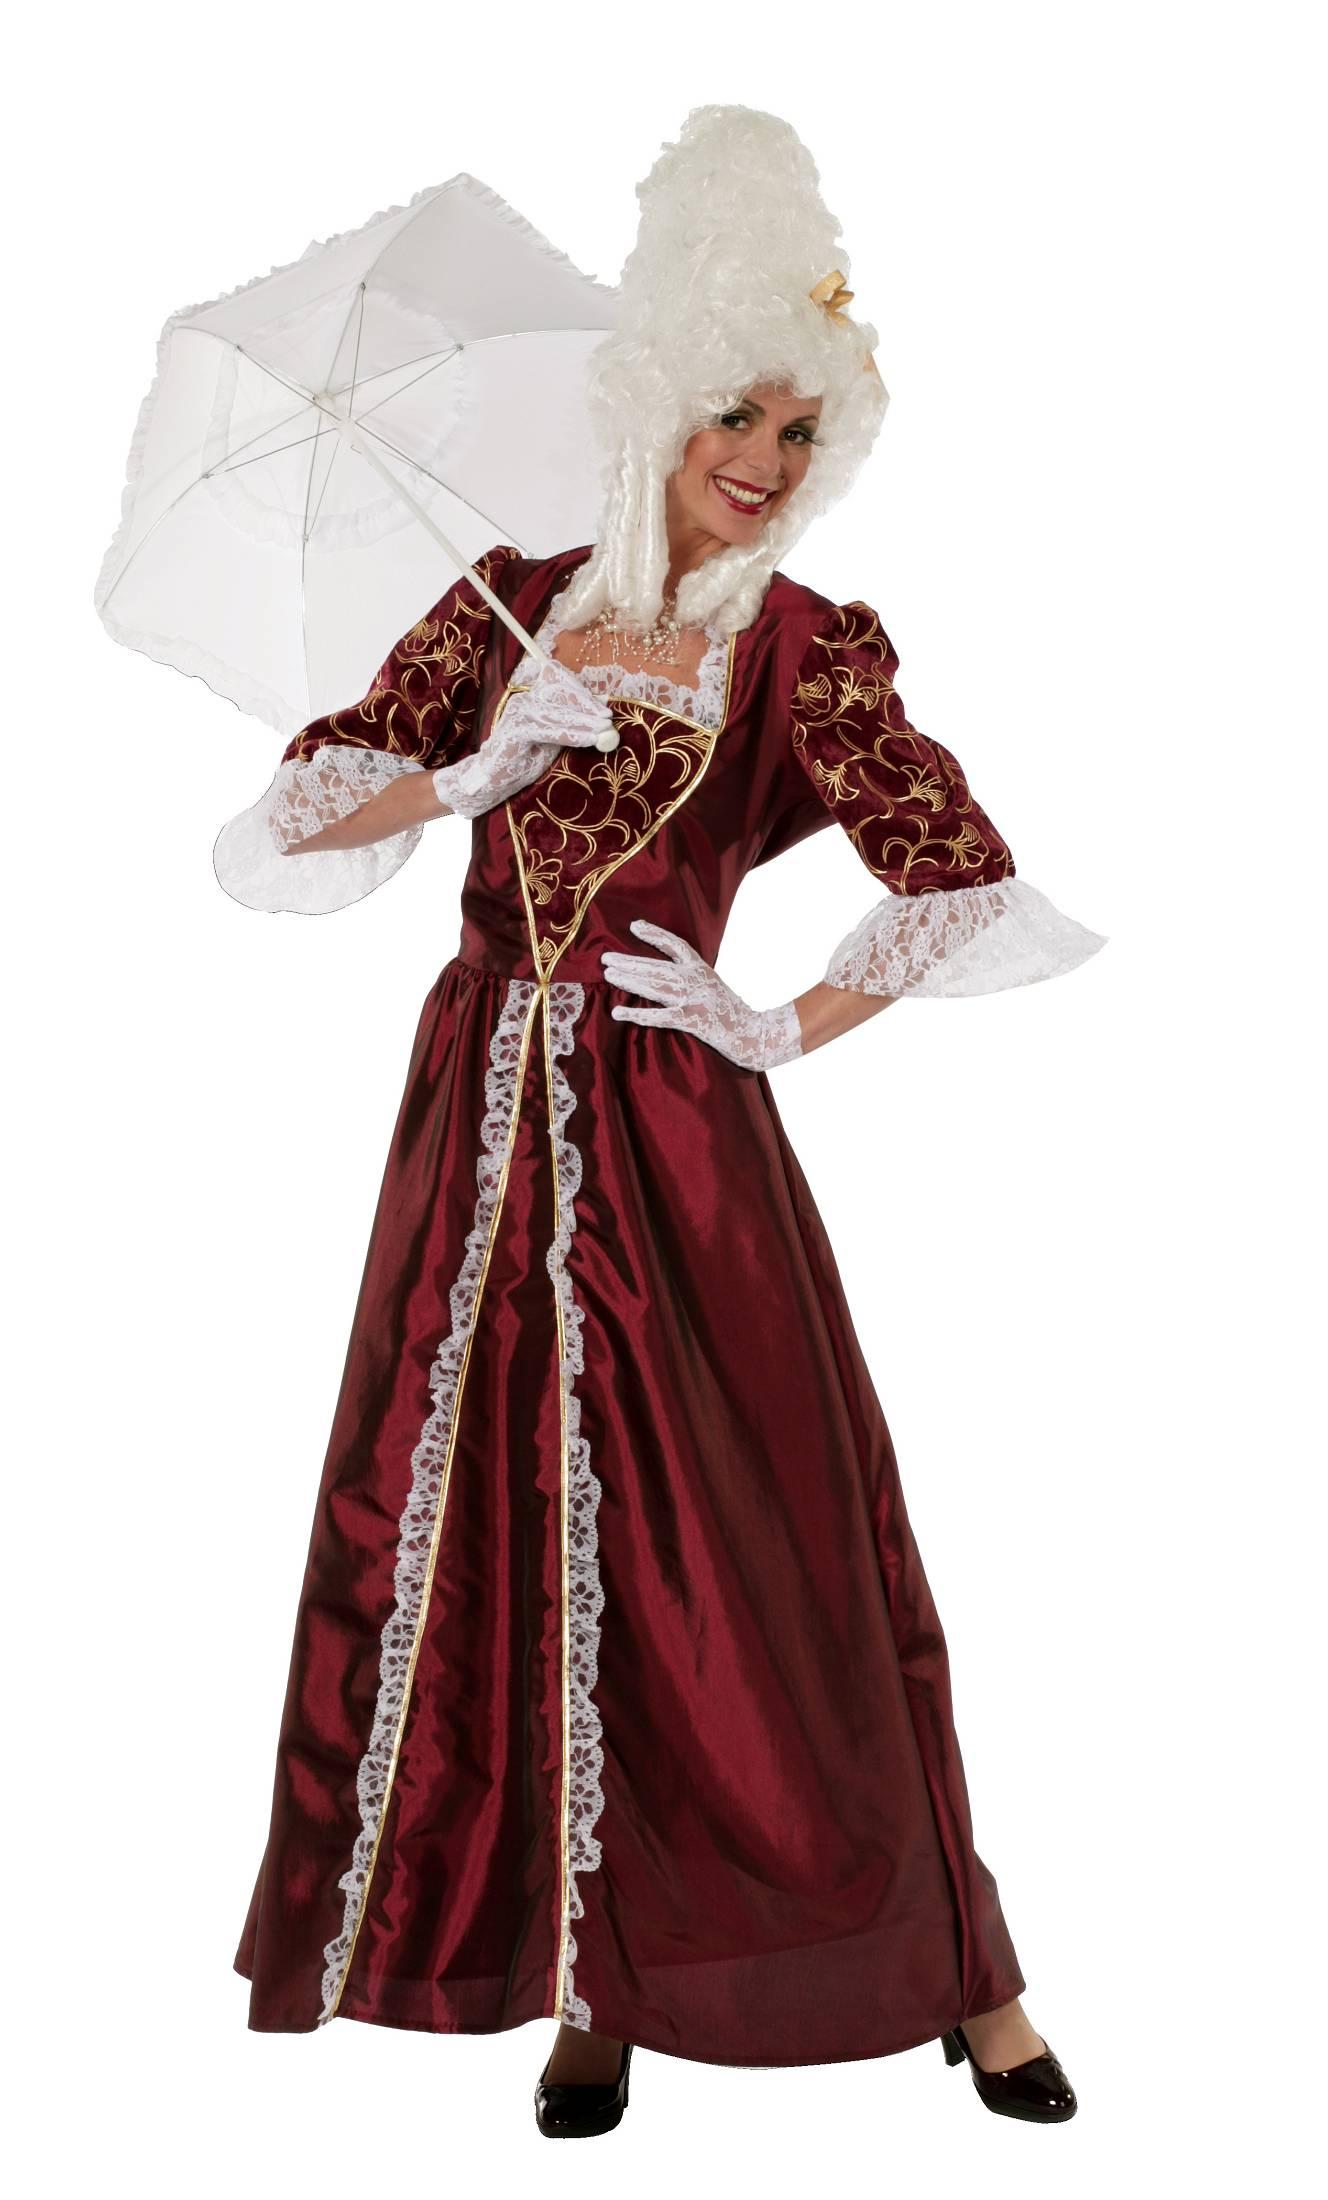 Costume-Marquise-Bordeaux-Grande-Taille